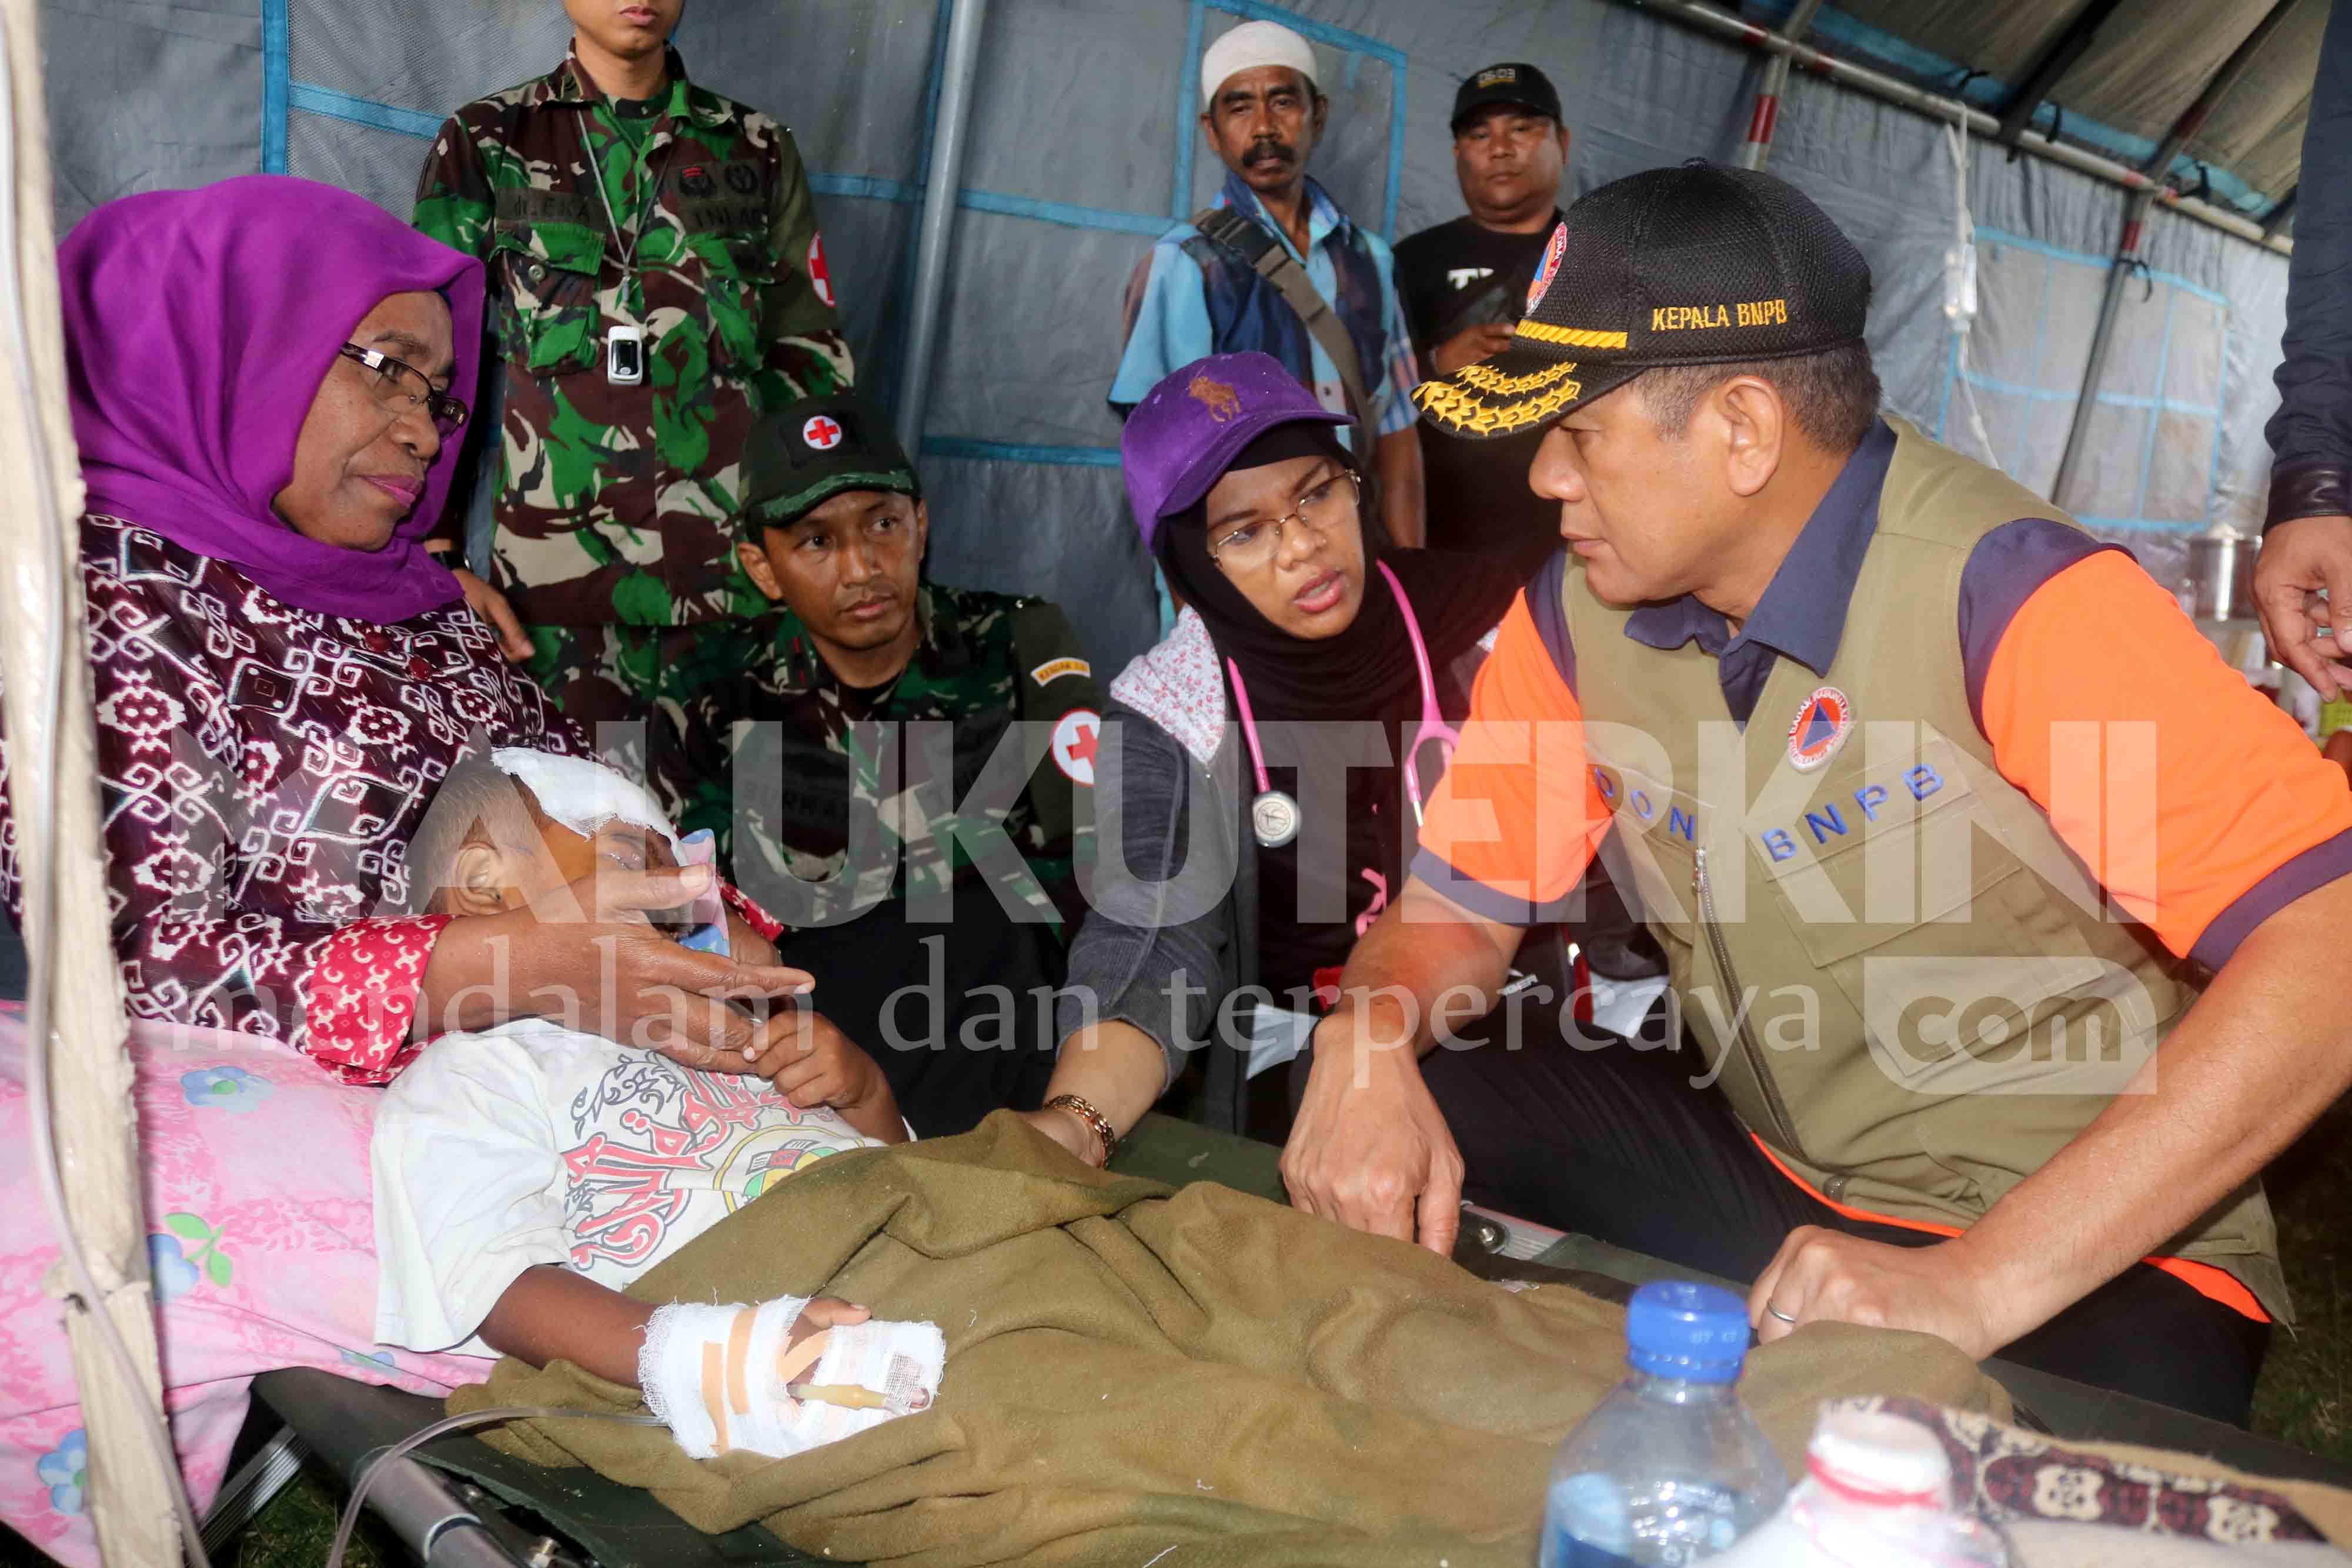 Presiden Instruksikan Kepala BNPB Tindak Lanjut Penanganan Bencana di Maluku